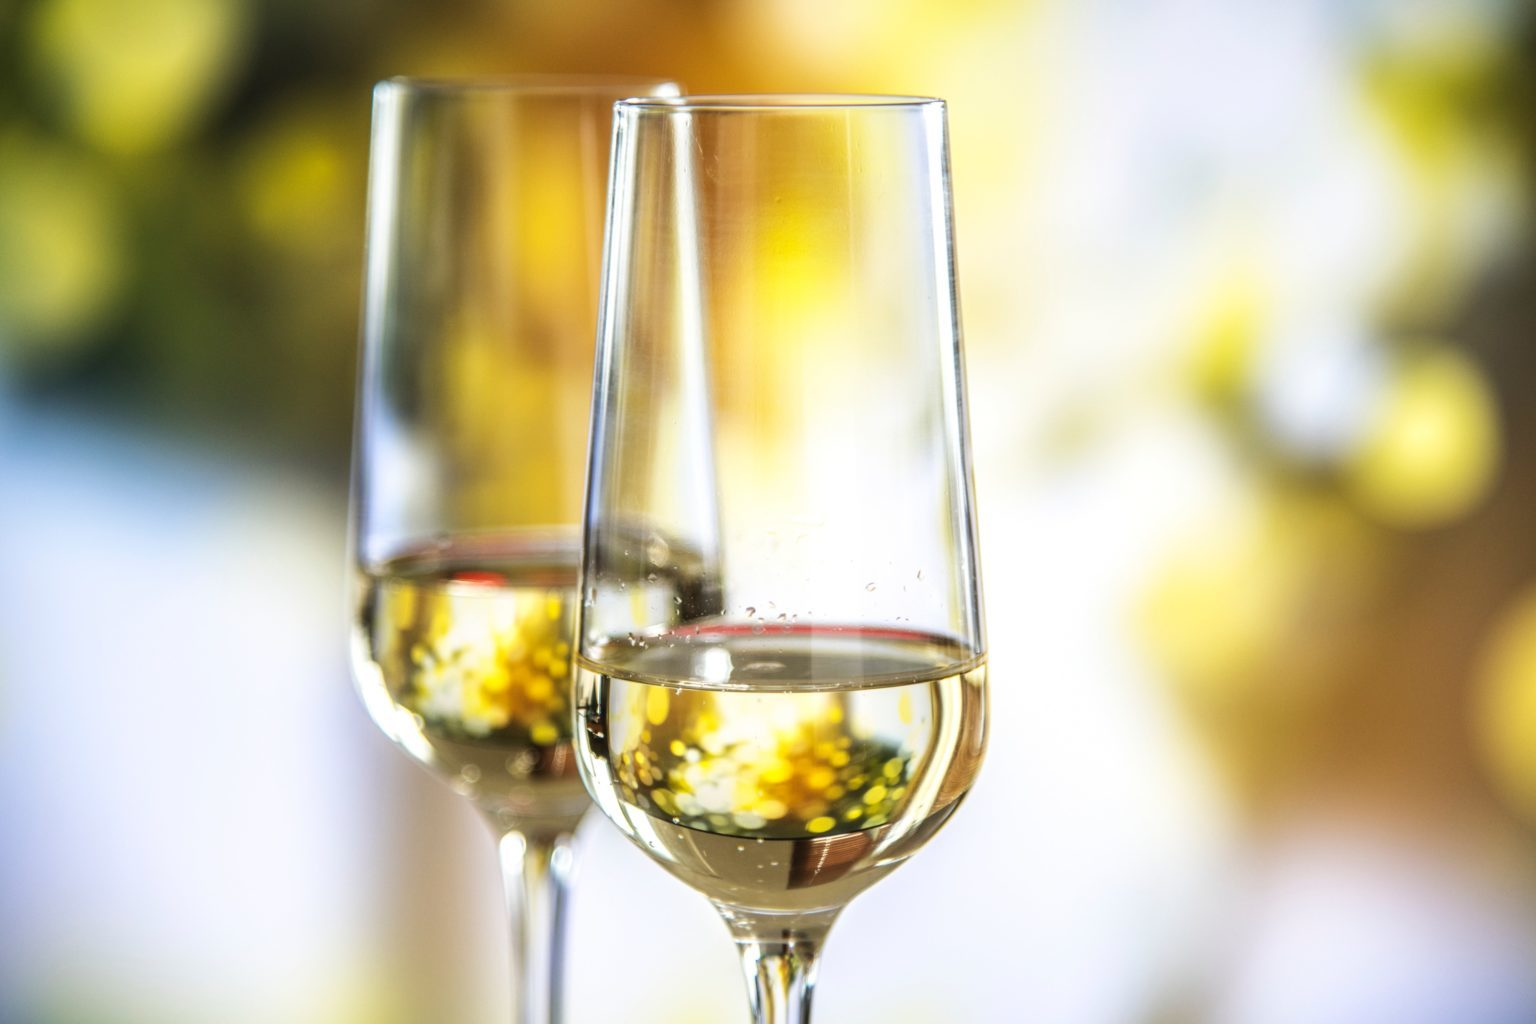 Sparkling Wines Market